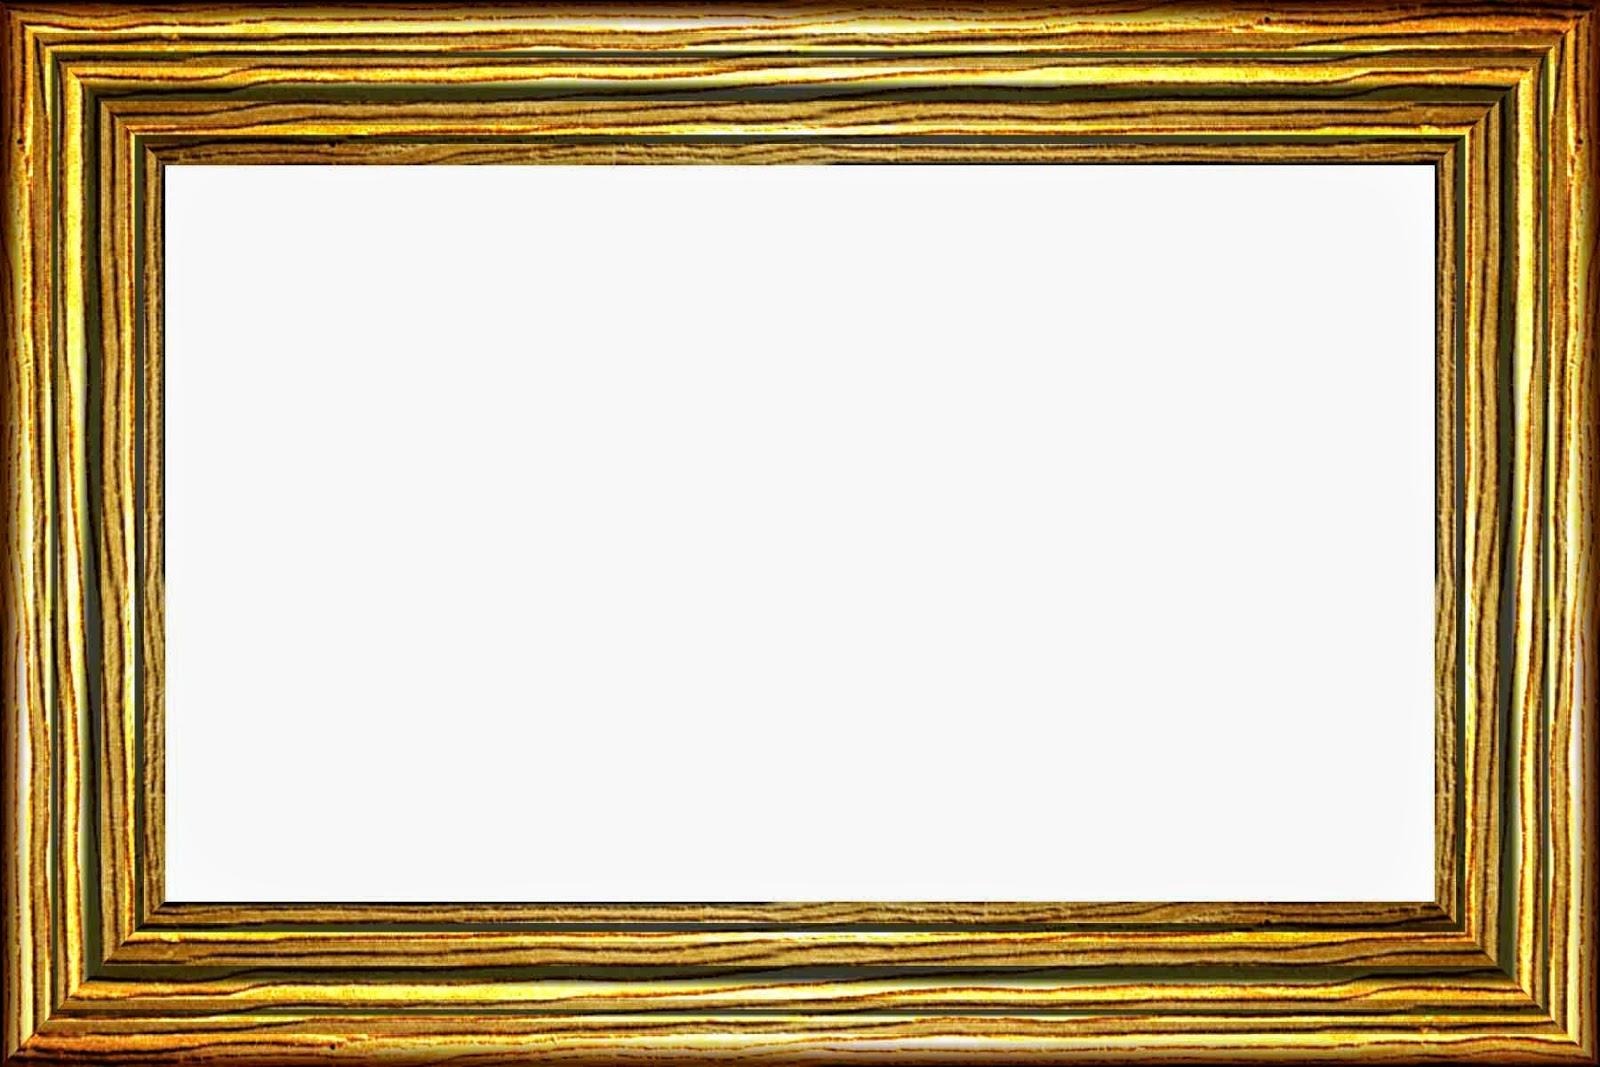 rusty metal frame wooden frame rough fiber metallic wooden frame